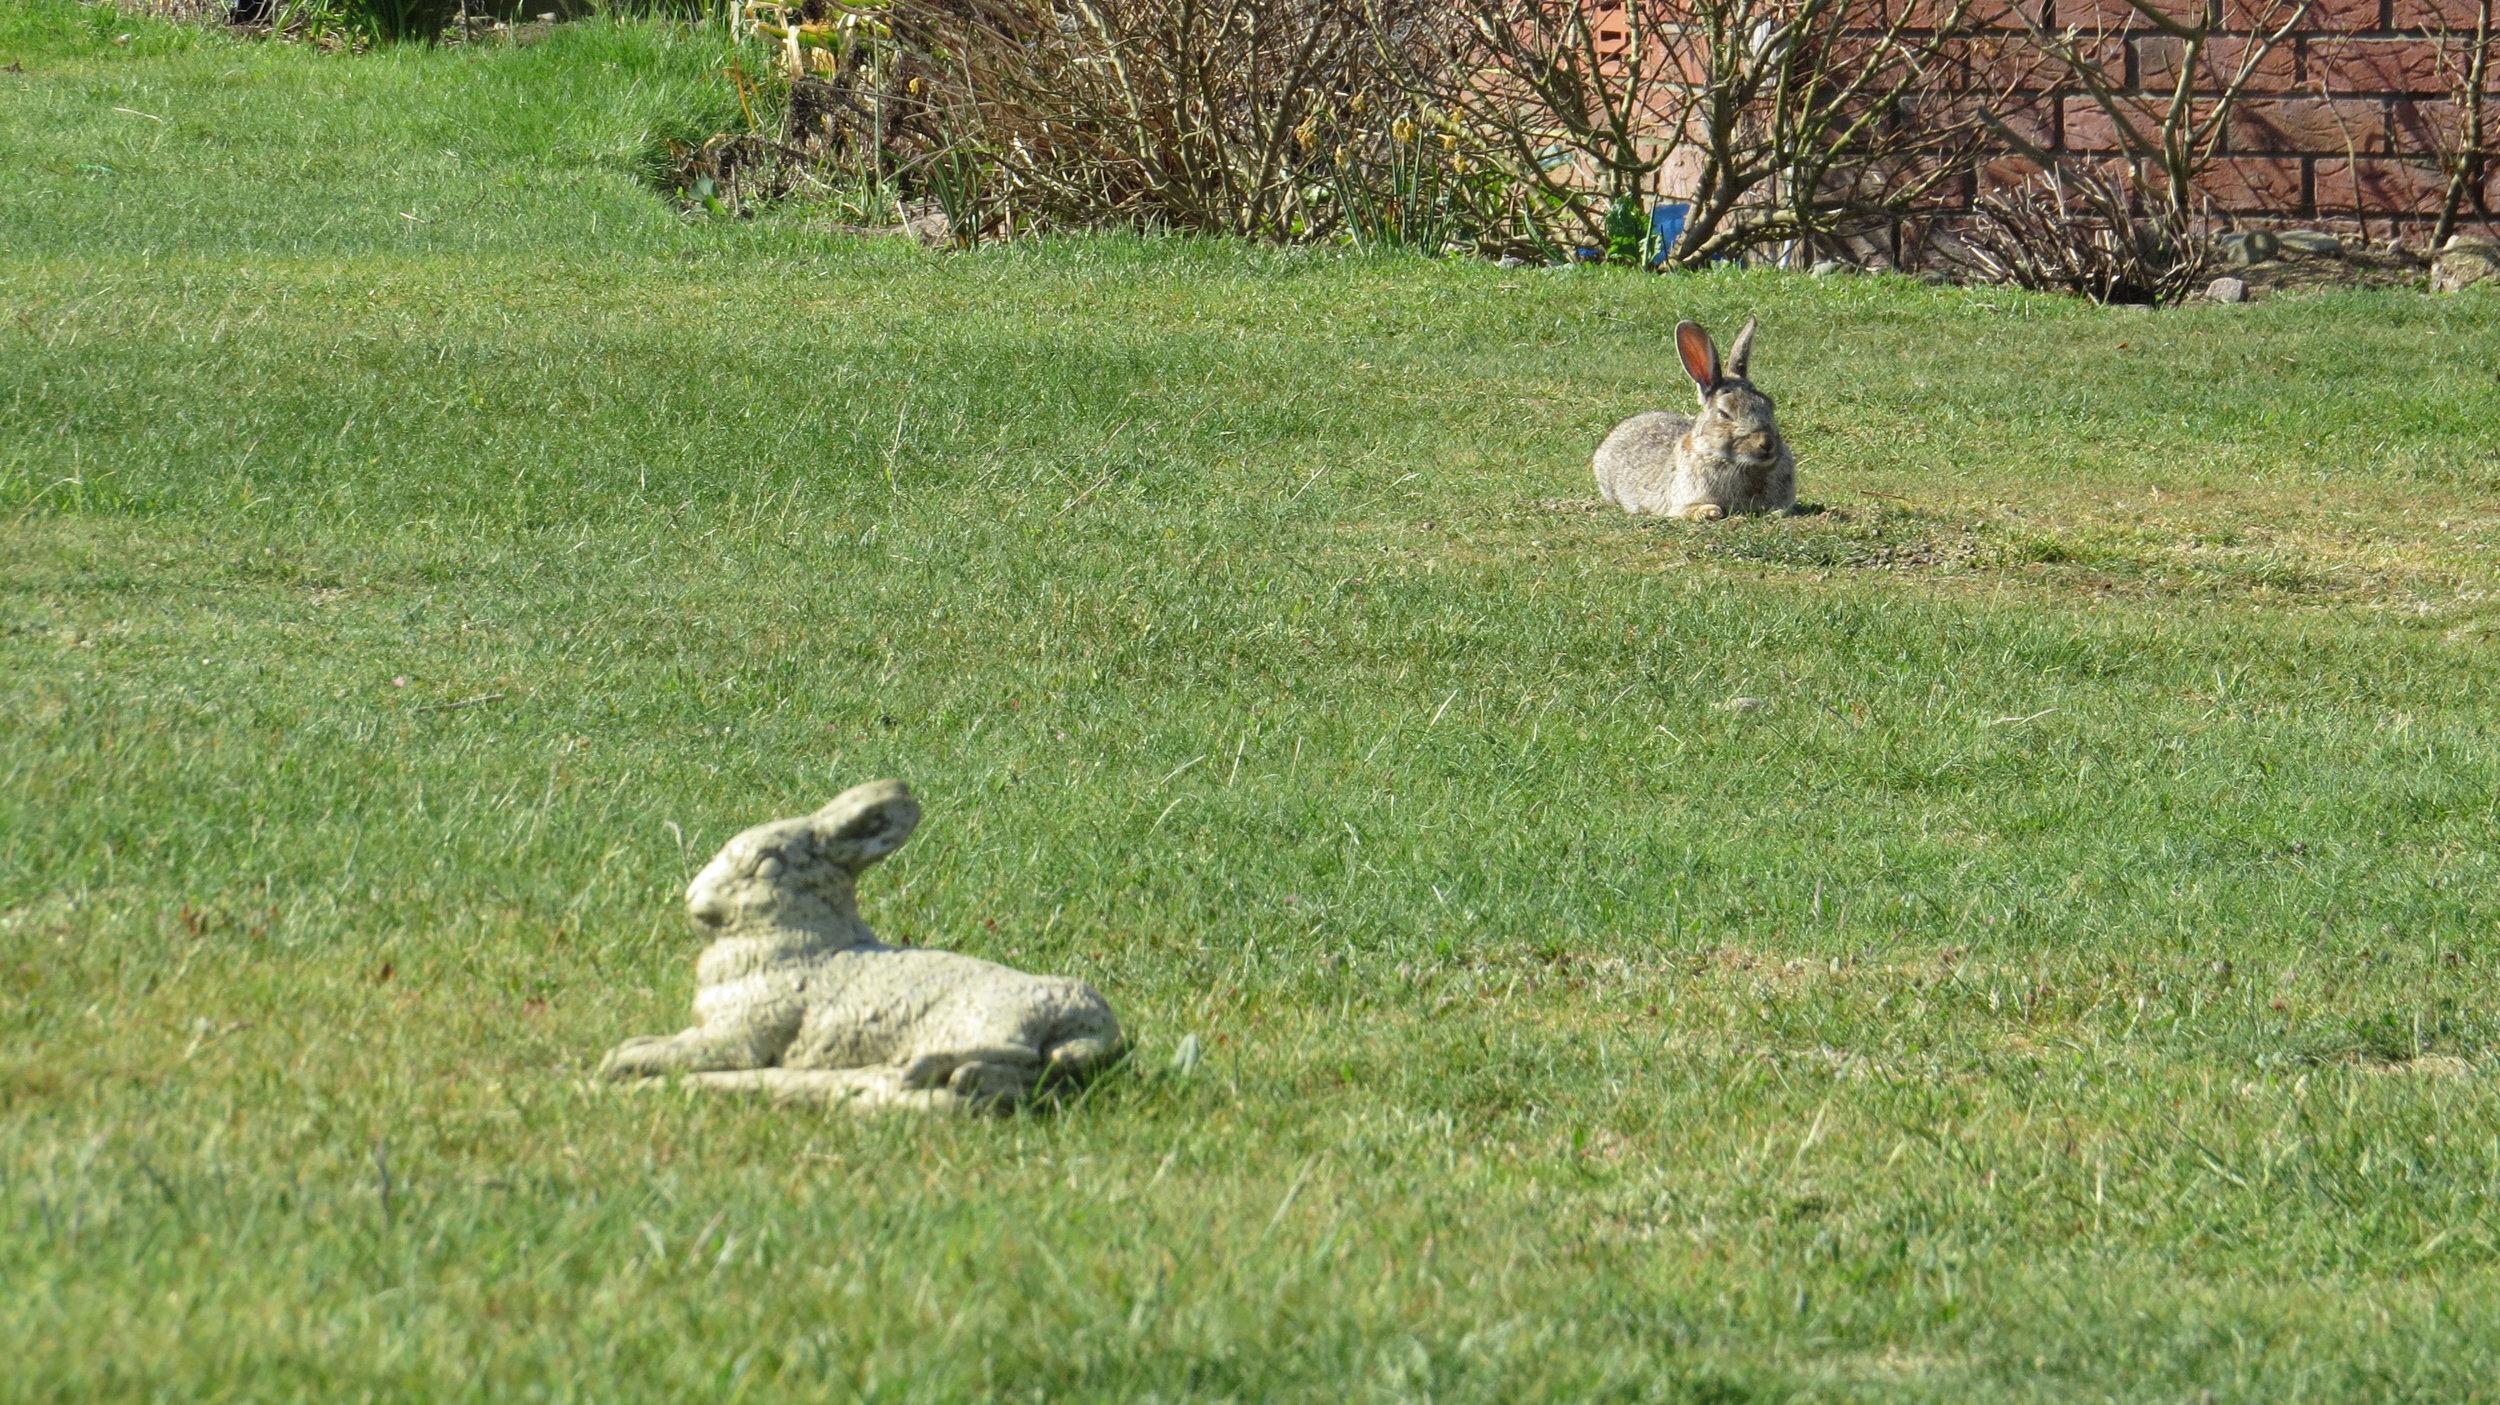 Rabbit Statue & Real Rabbit